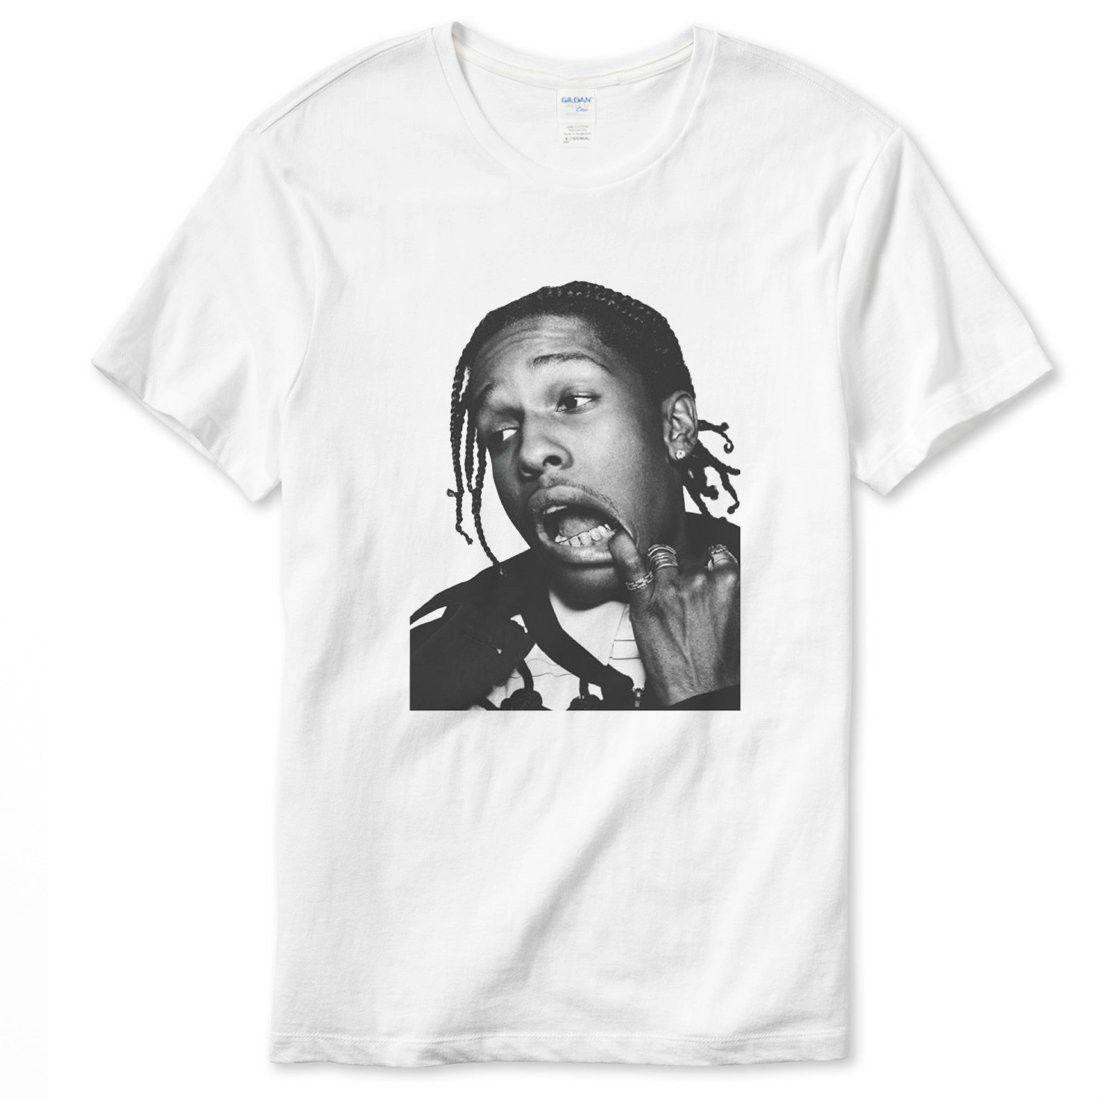 f40b9cfc148 ASAP Rocky Rap Hip Hop T Shirt Humor Shirts Offensive T Shirt From  Thegoozler